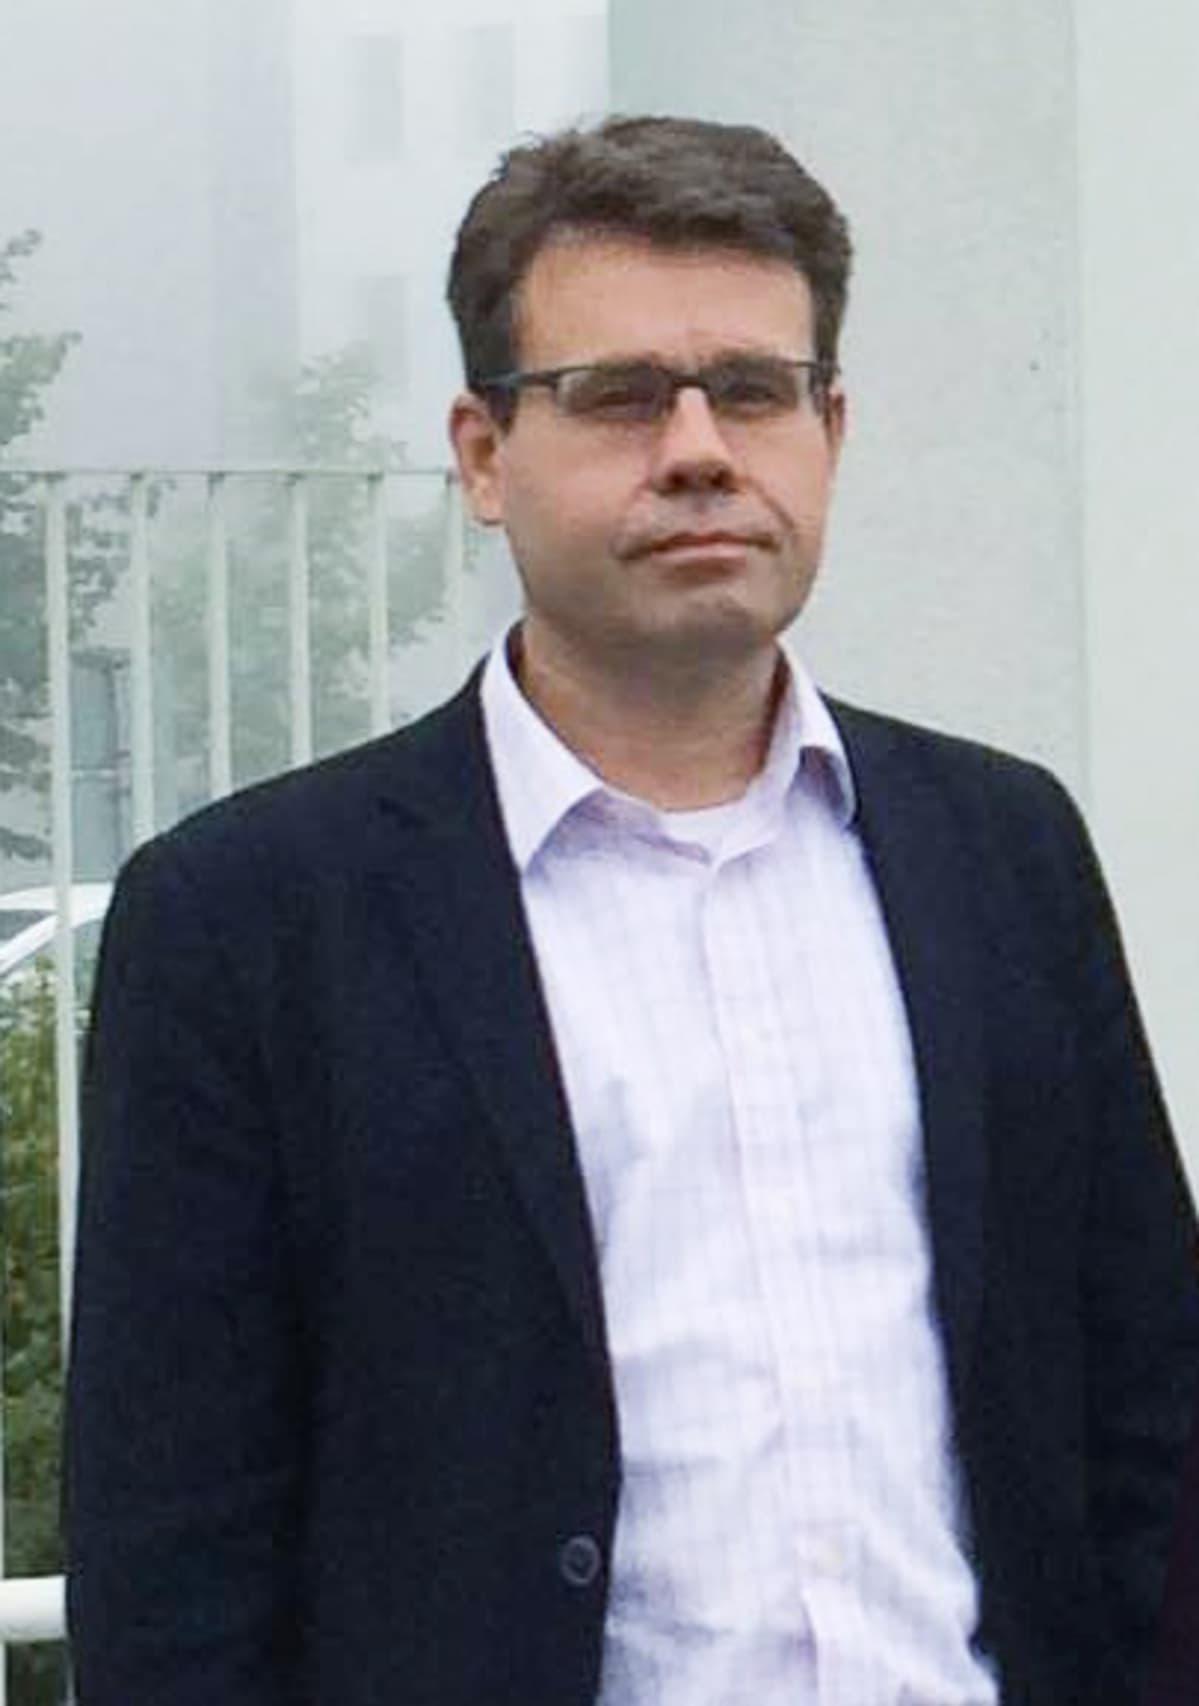 Juha Lavapuro